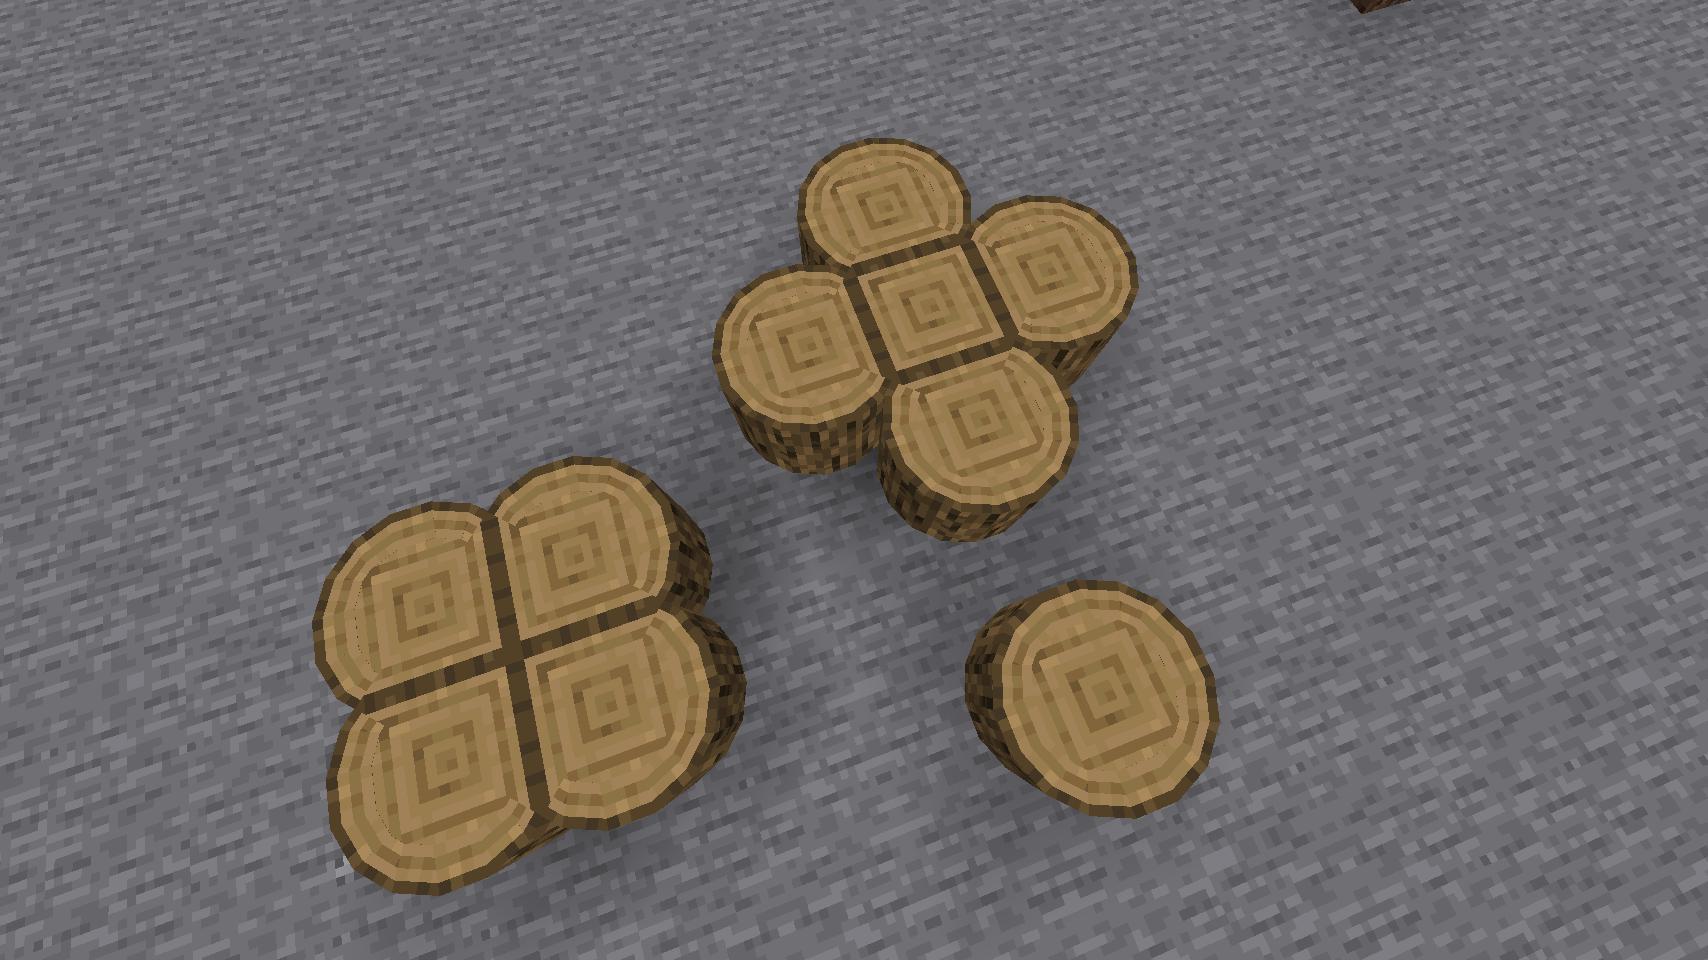 Petter Foliage Minecraft Texture Pack